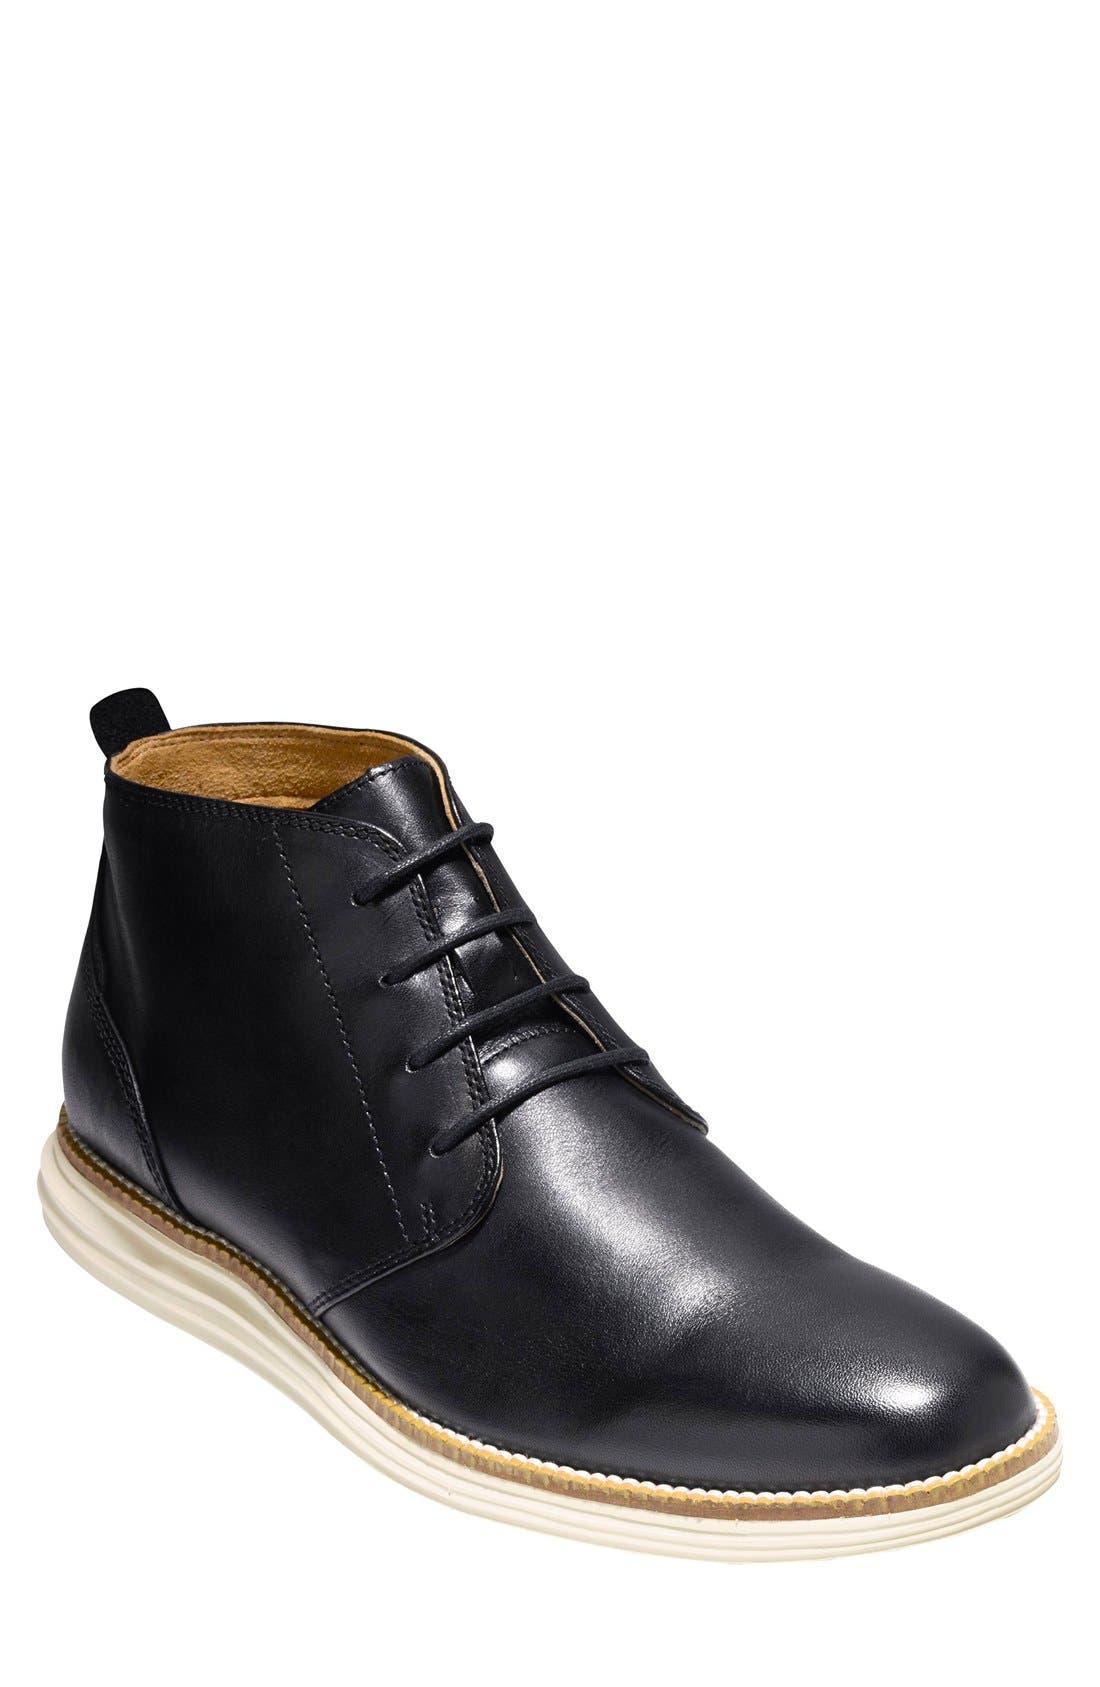 'Original Grand' Chukka Boot, Main, color, 001